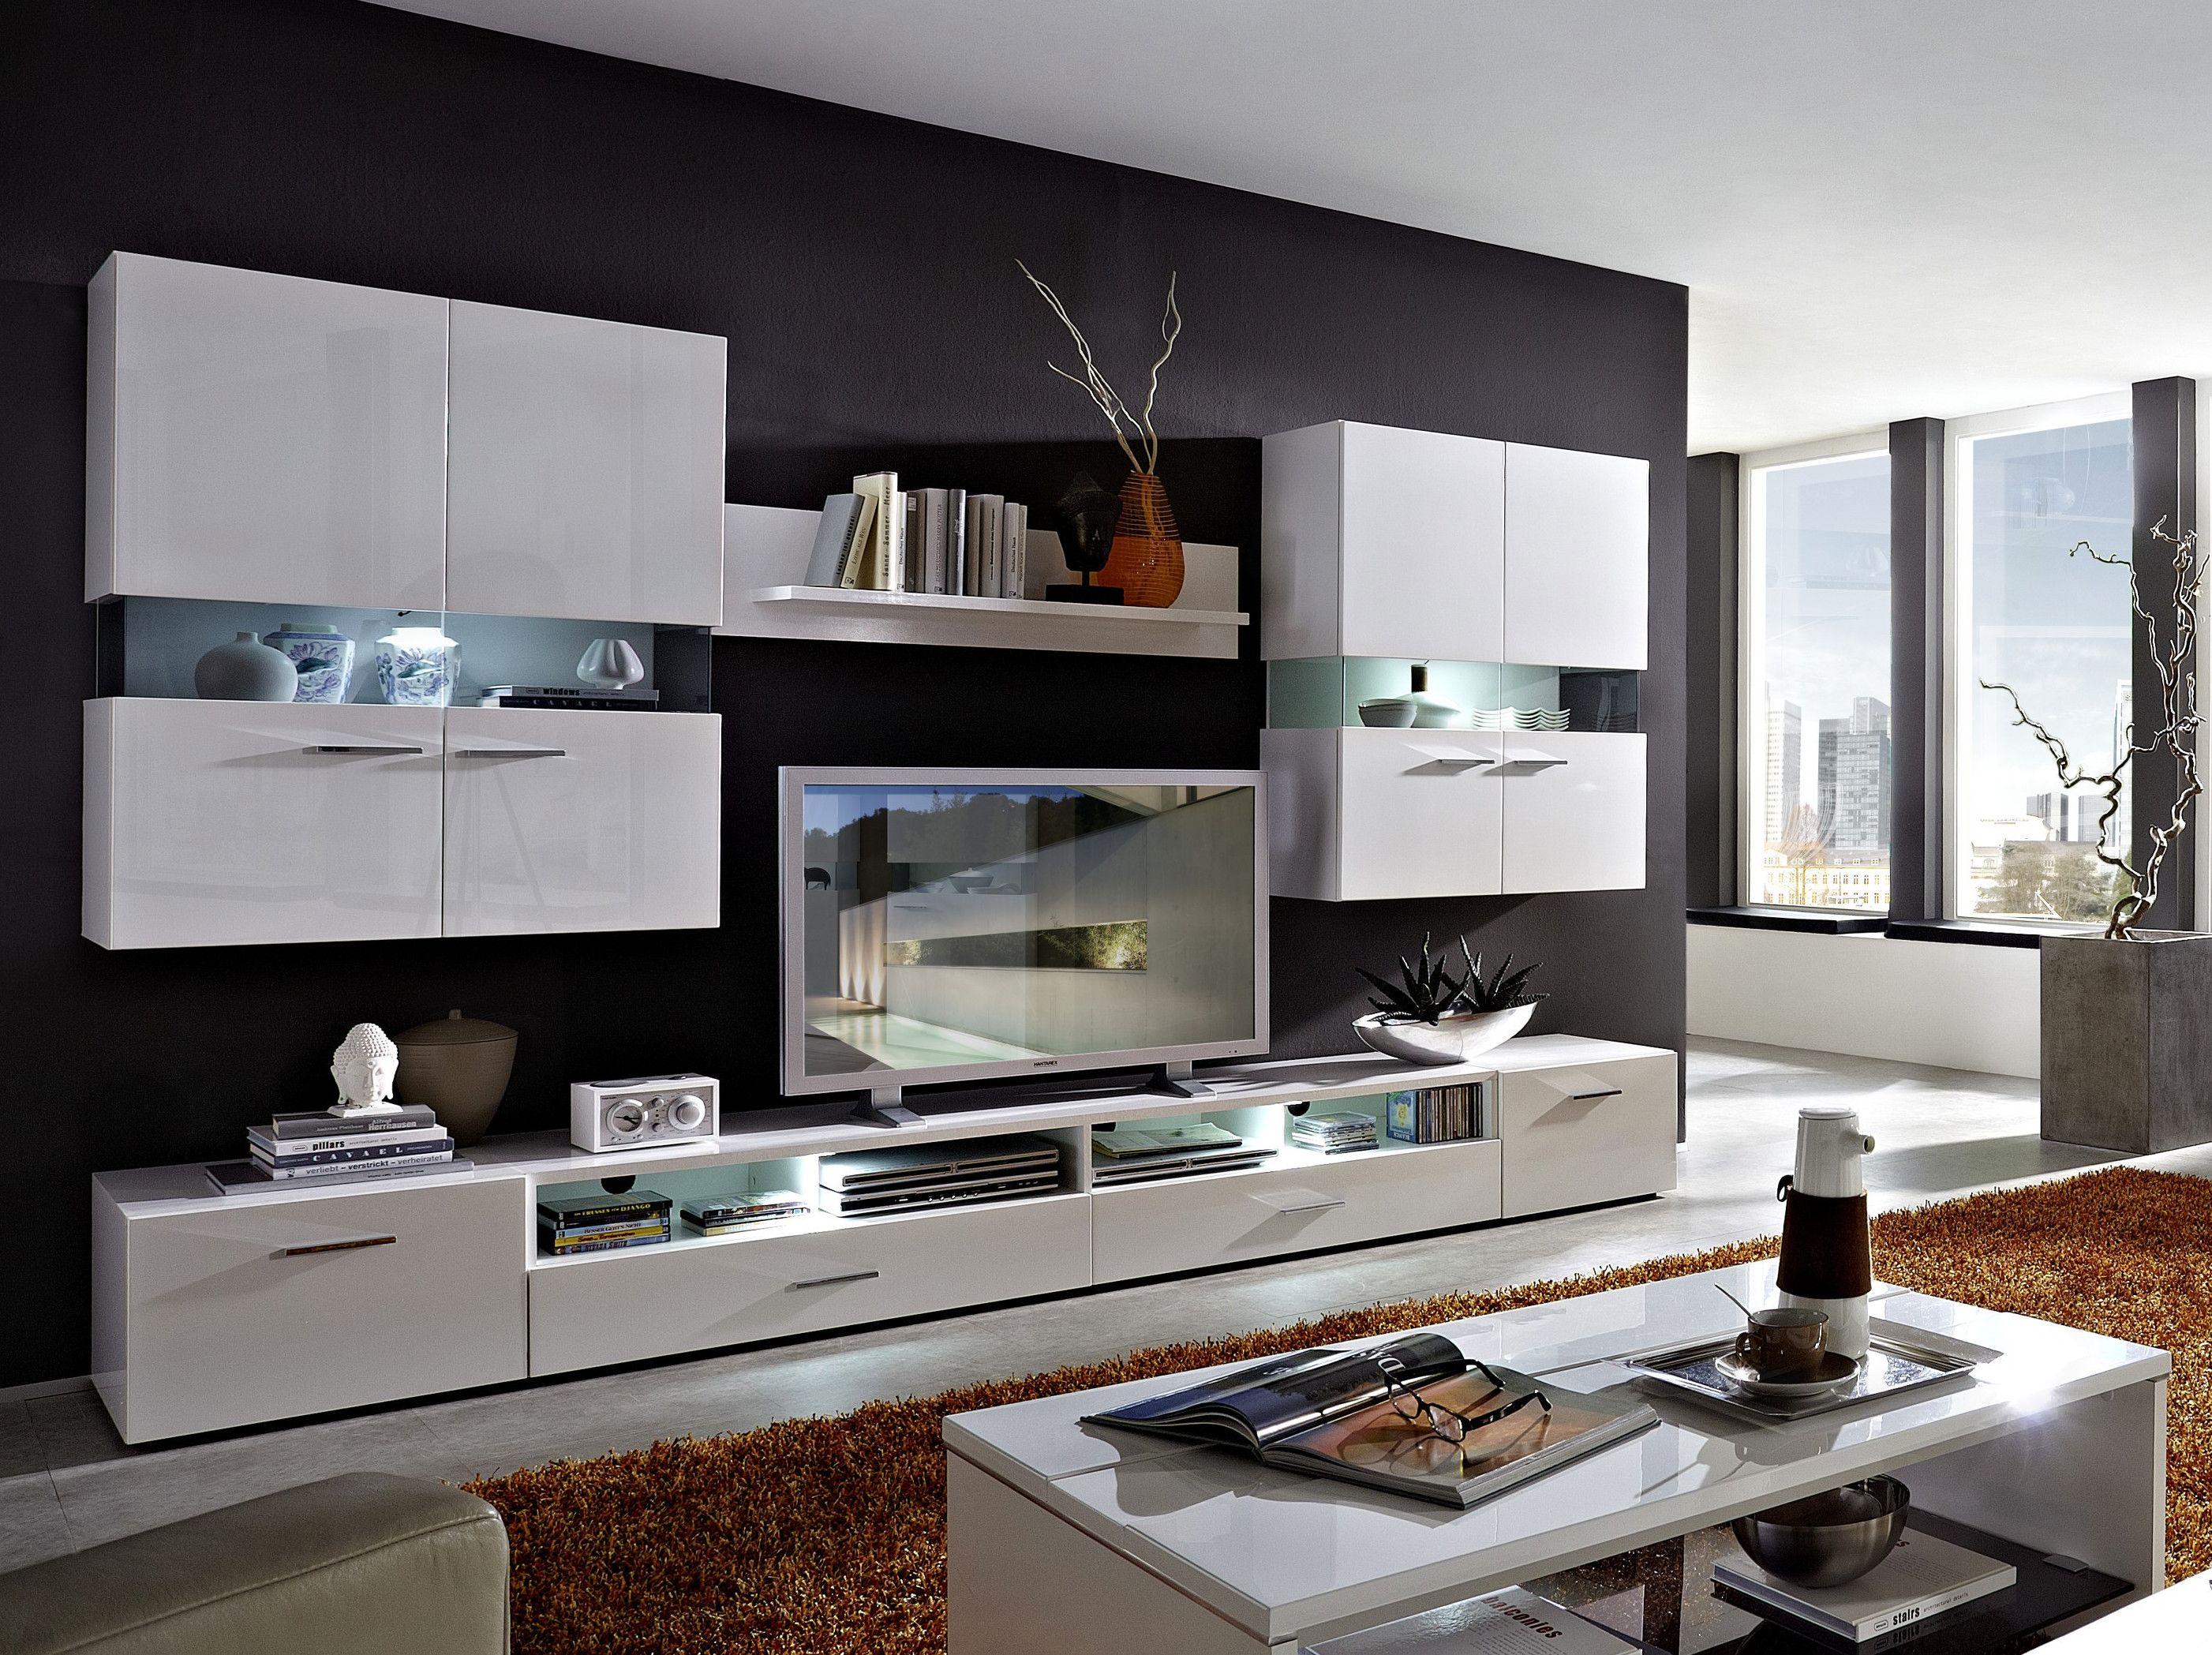 Wohnzimmer Hochglanz ~ Wohnwand weiss hochglanz glas parsol grau woody 22 00421 modern